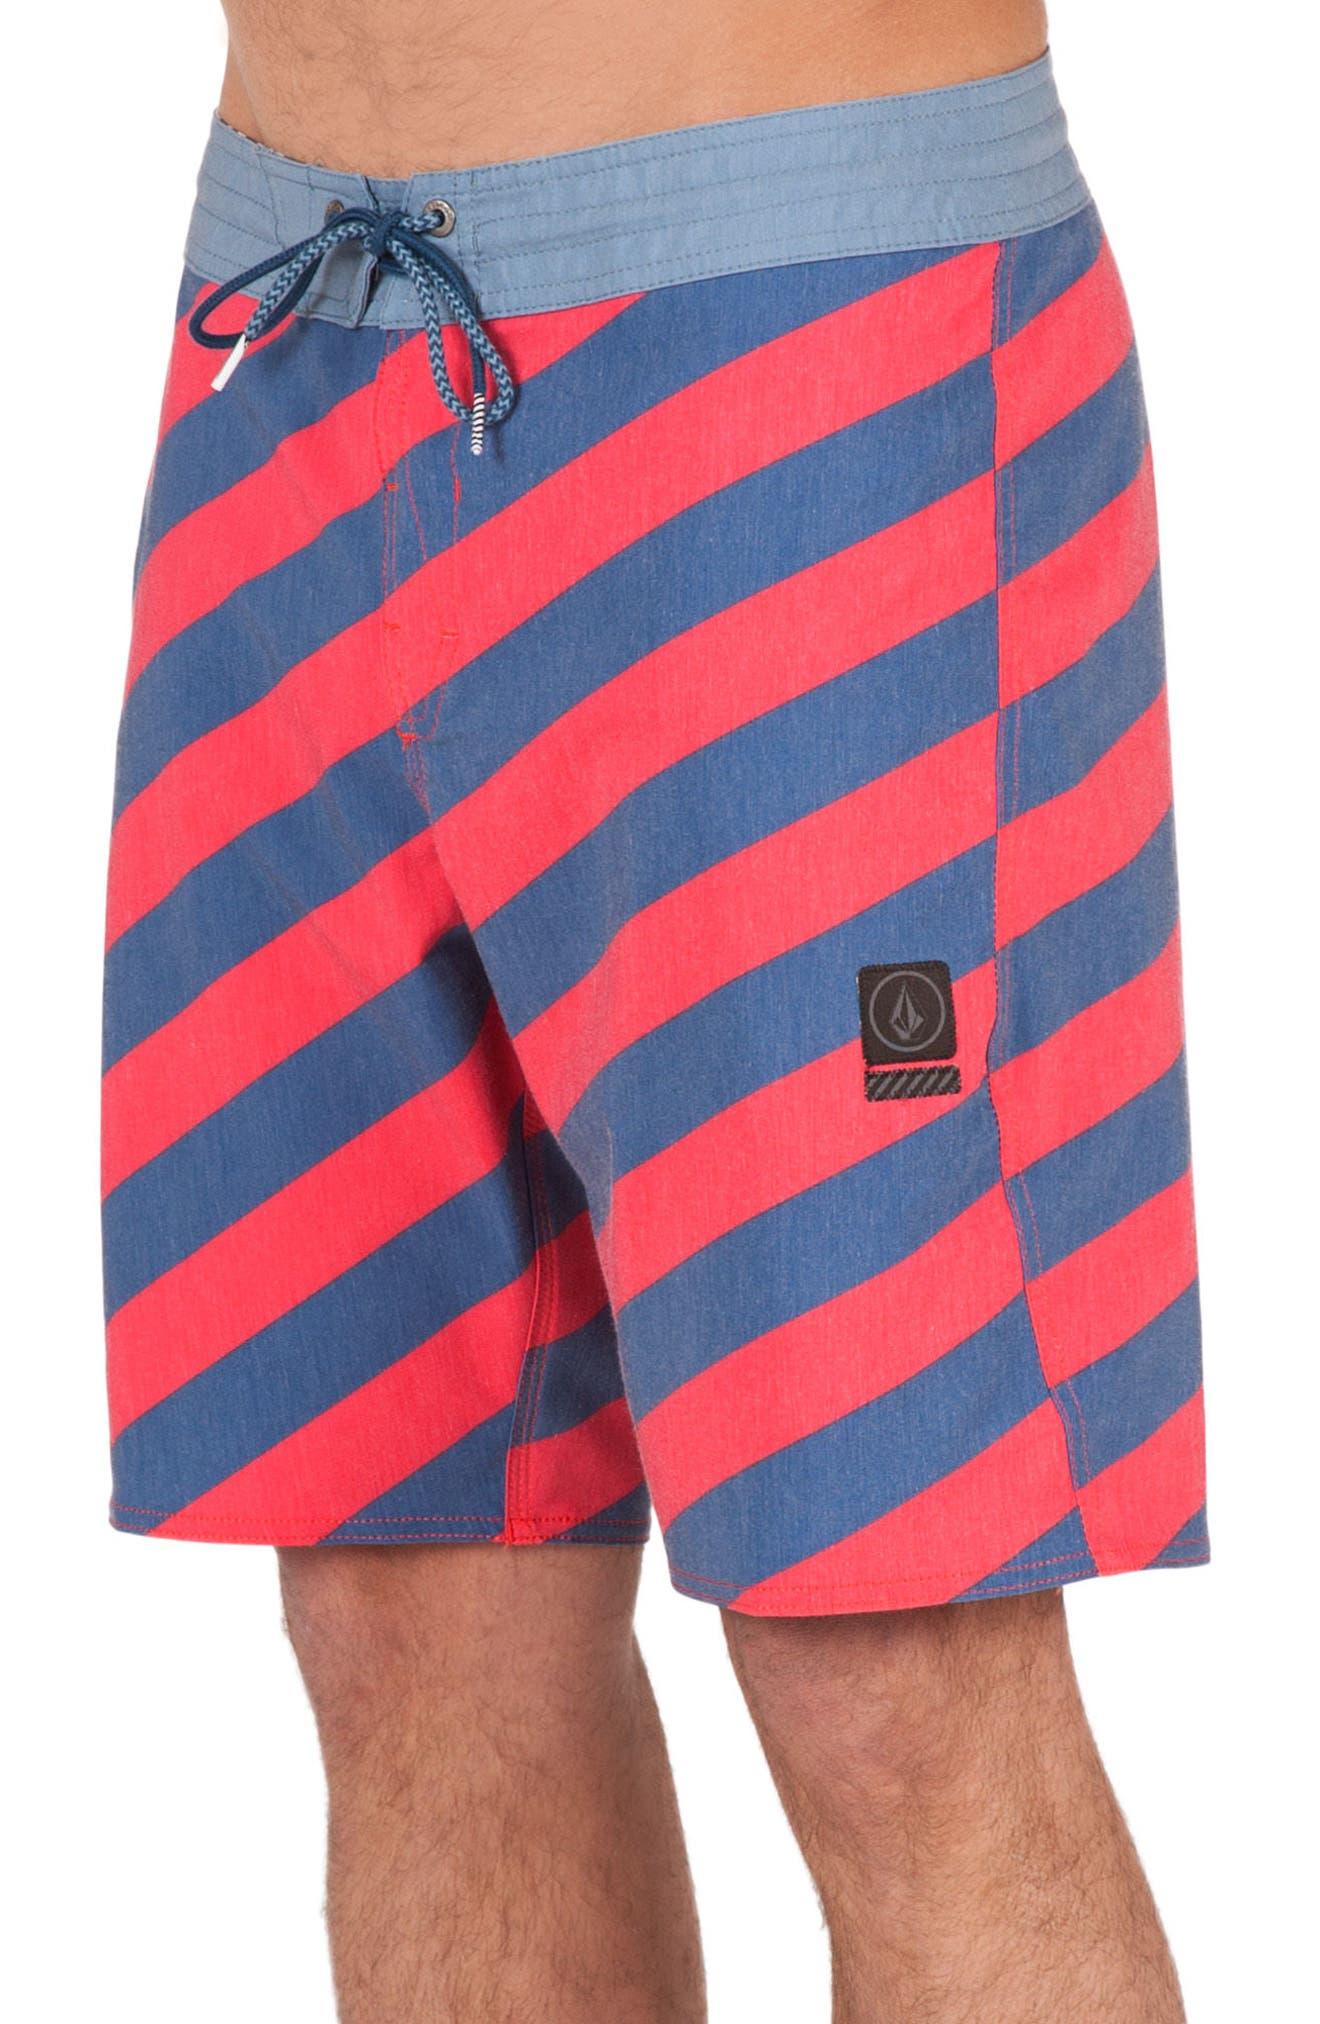 Stripey Slinger Board Shorts,                             Main thumbnail 9, color,